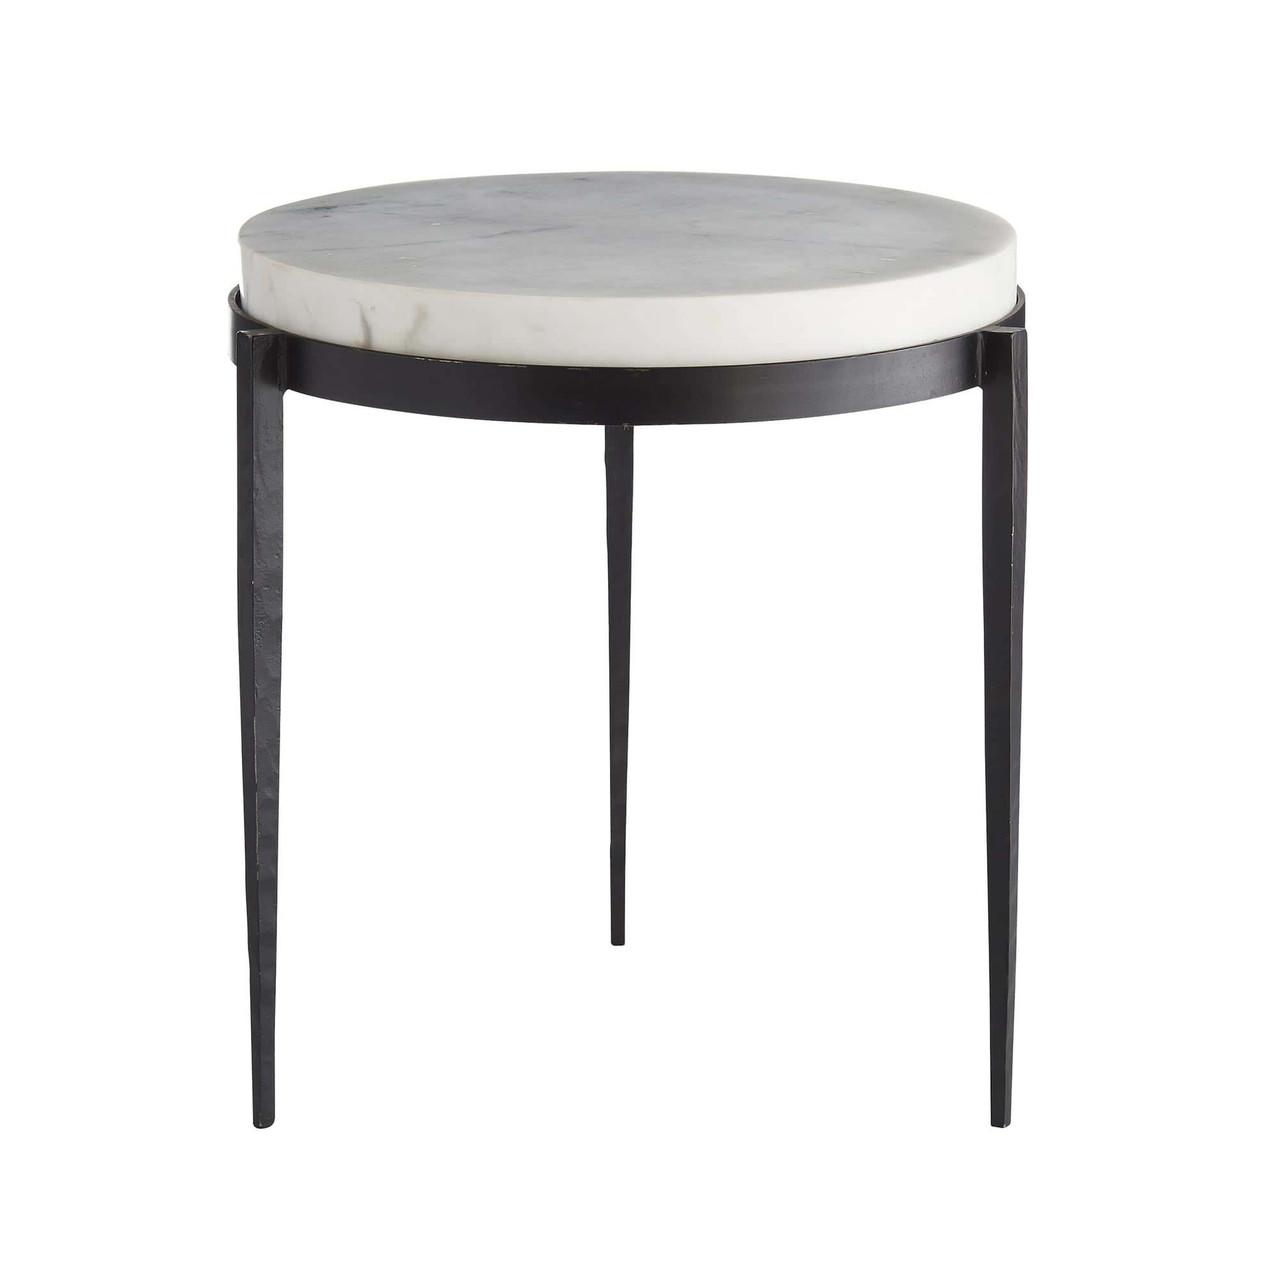 Elise Side Table Black Iron Legs, White Marble Top